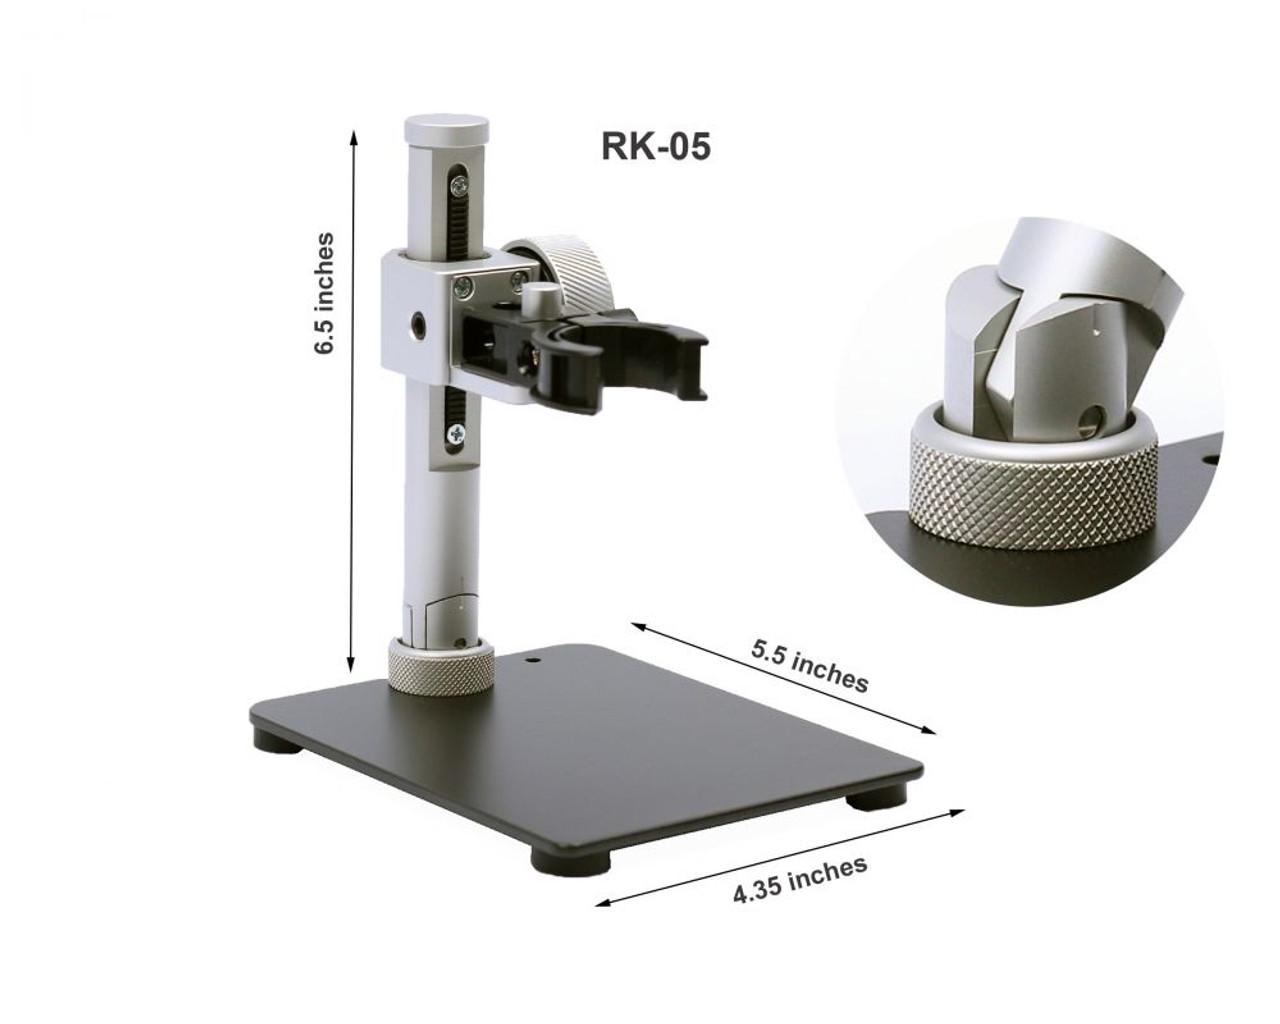 RK-05